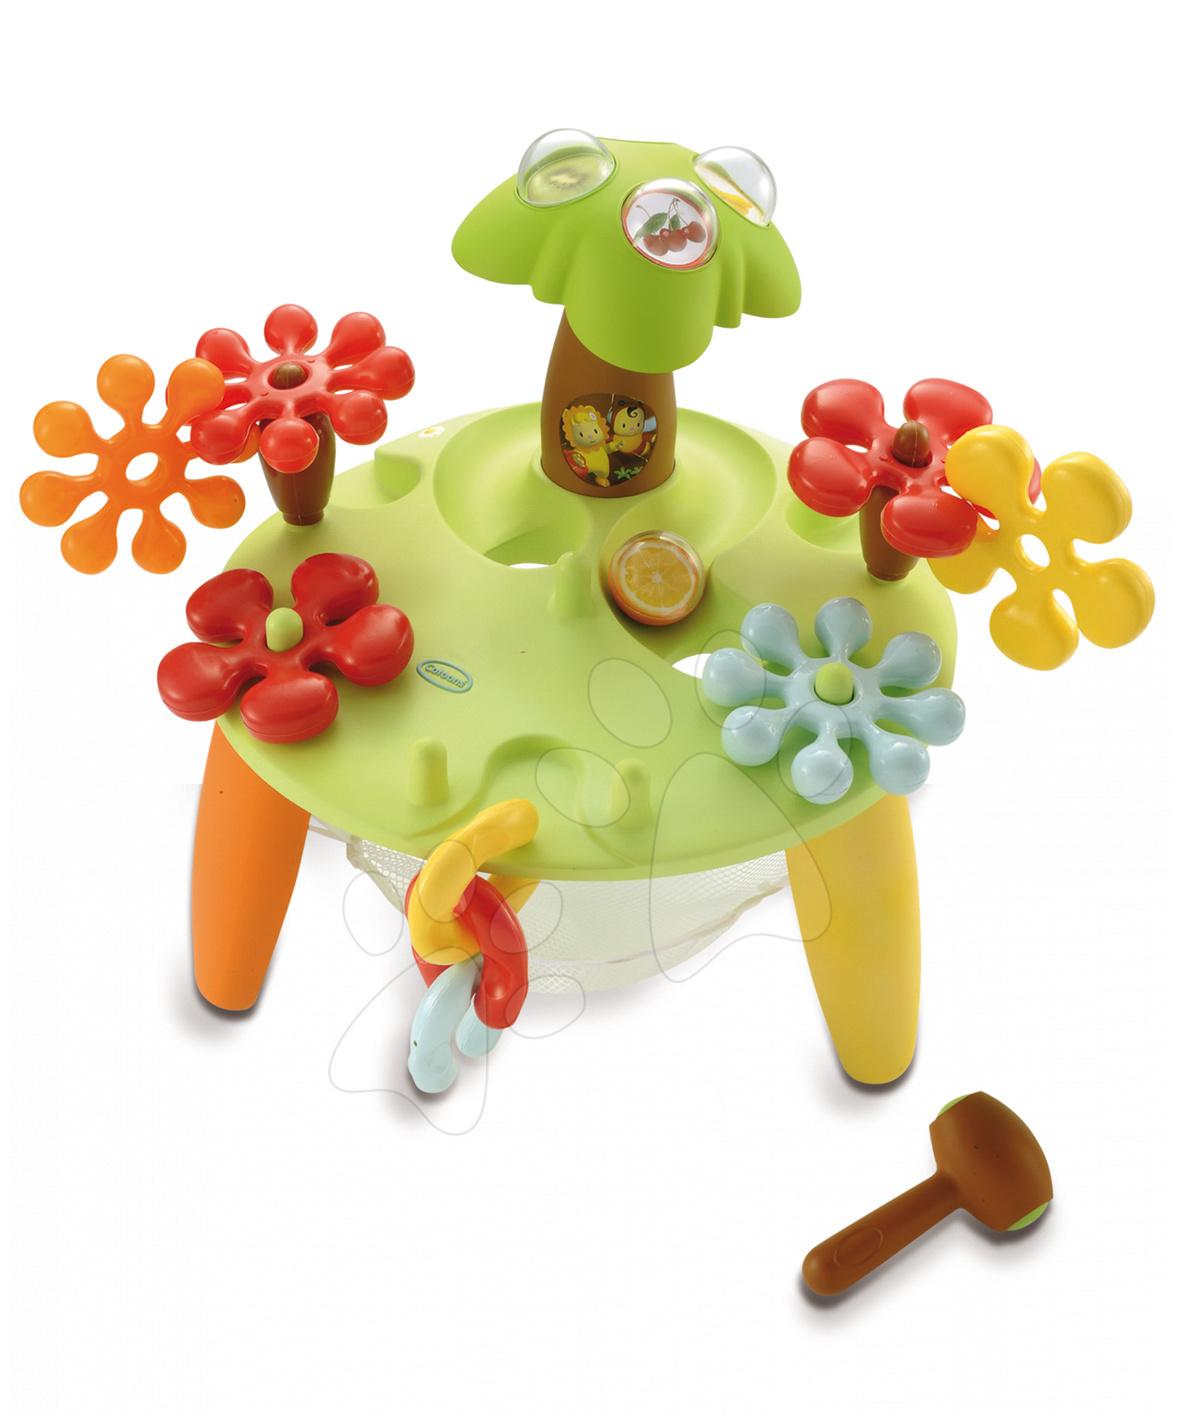 Didaktický stolek Cotoons Activity Tap Tap Smoby 211133 didaktický stolek Cotoons Activity Tap Tap